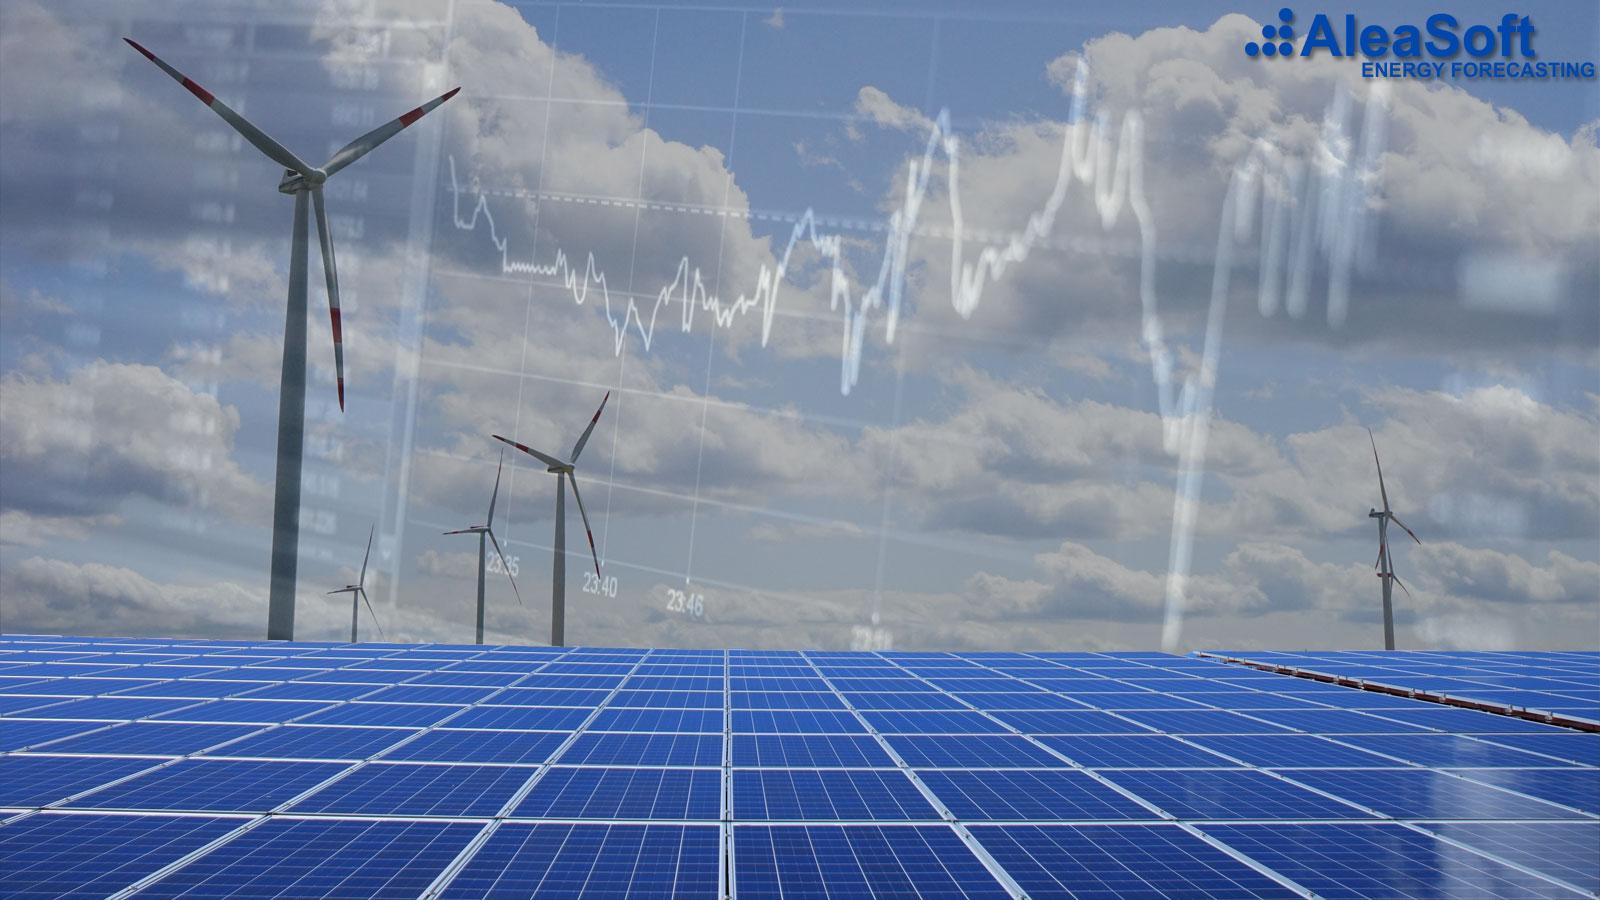 AleaSoft - Precios mercados eléctricos energia eólica